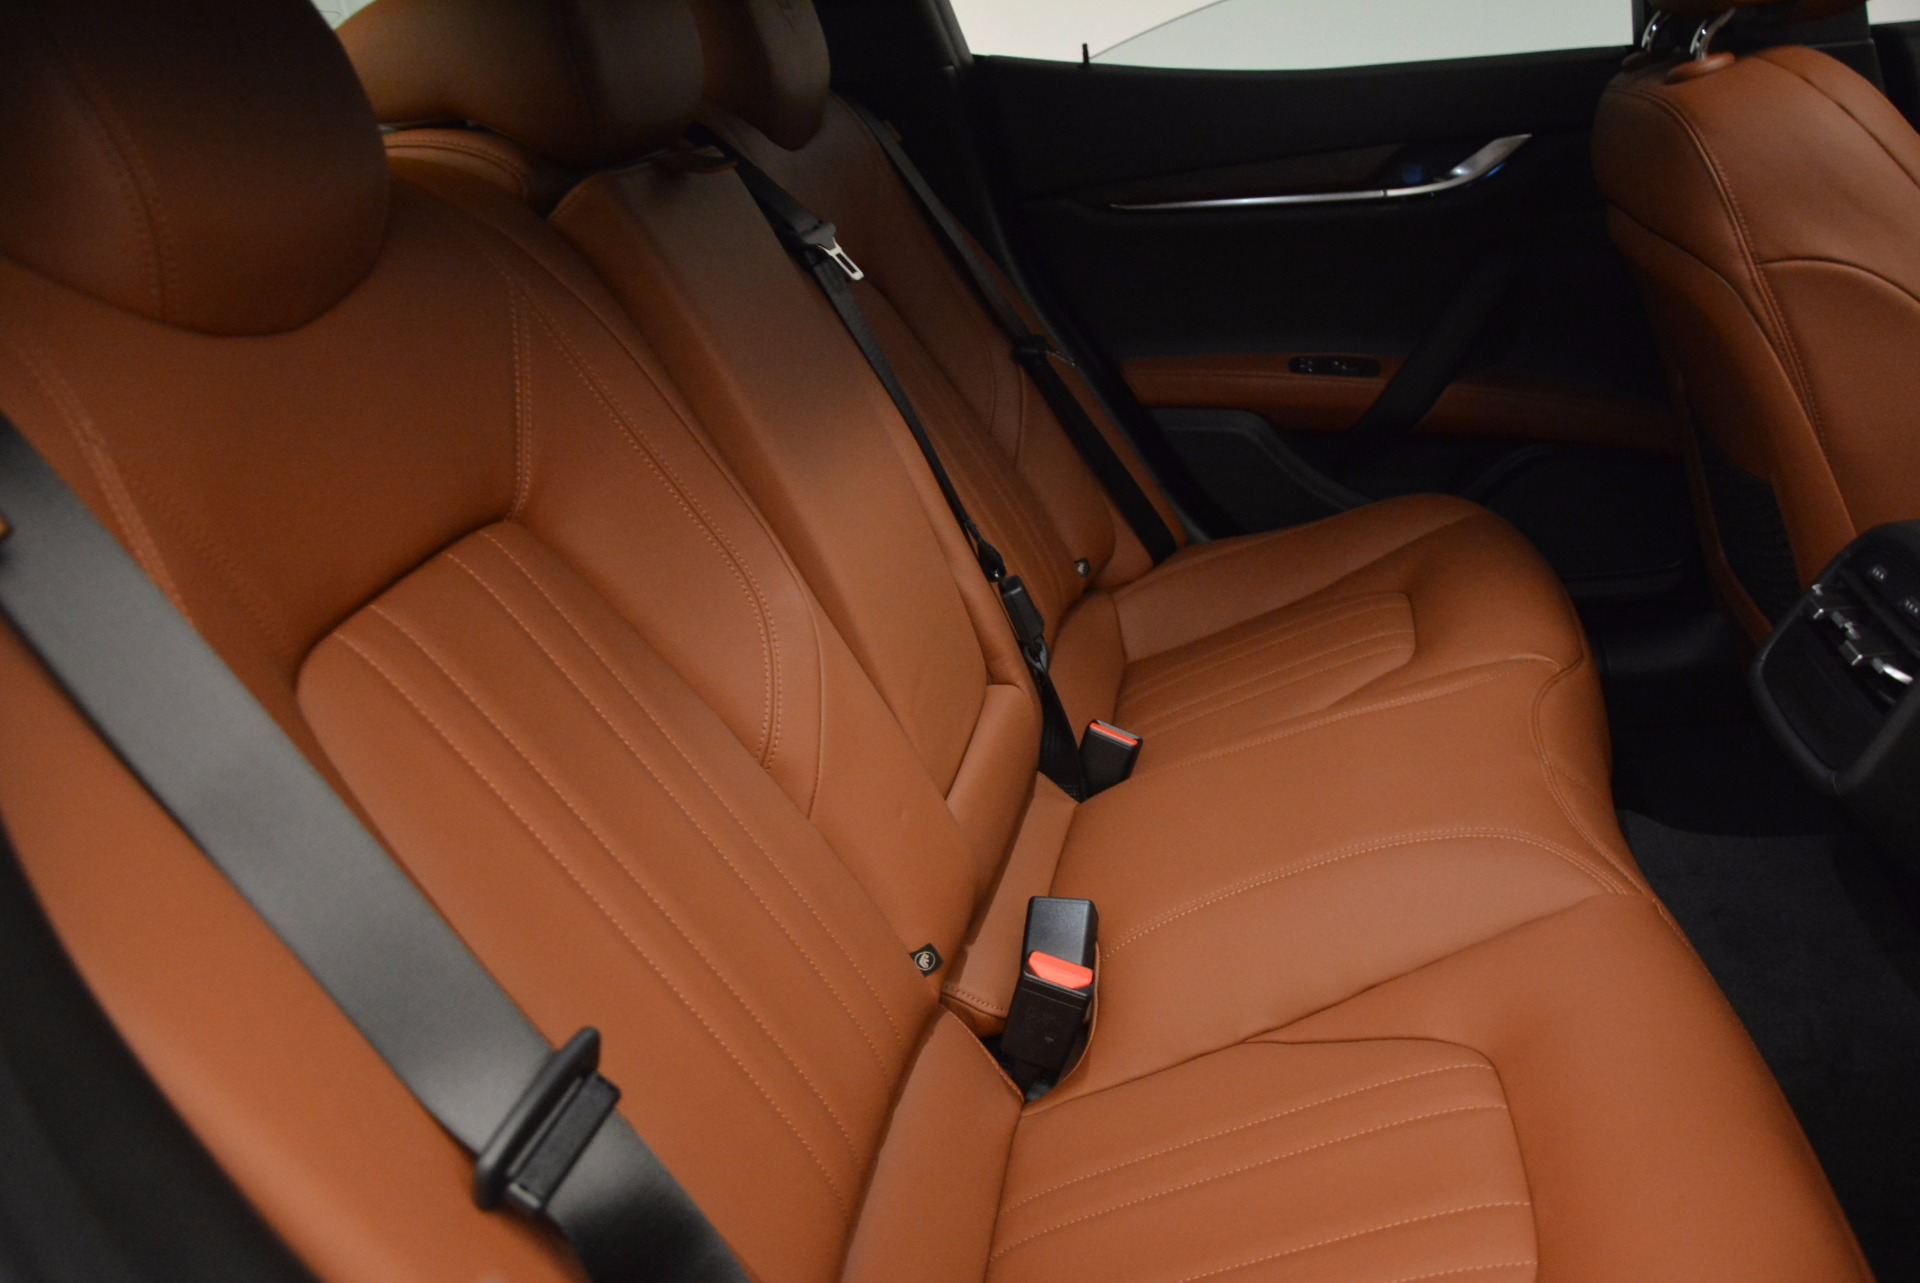 Used 2017 Maserati Ghibli S Q4 Ex-Loaner For Sale In Greenwich, CT 1166_p21